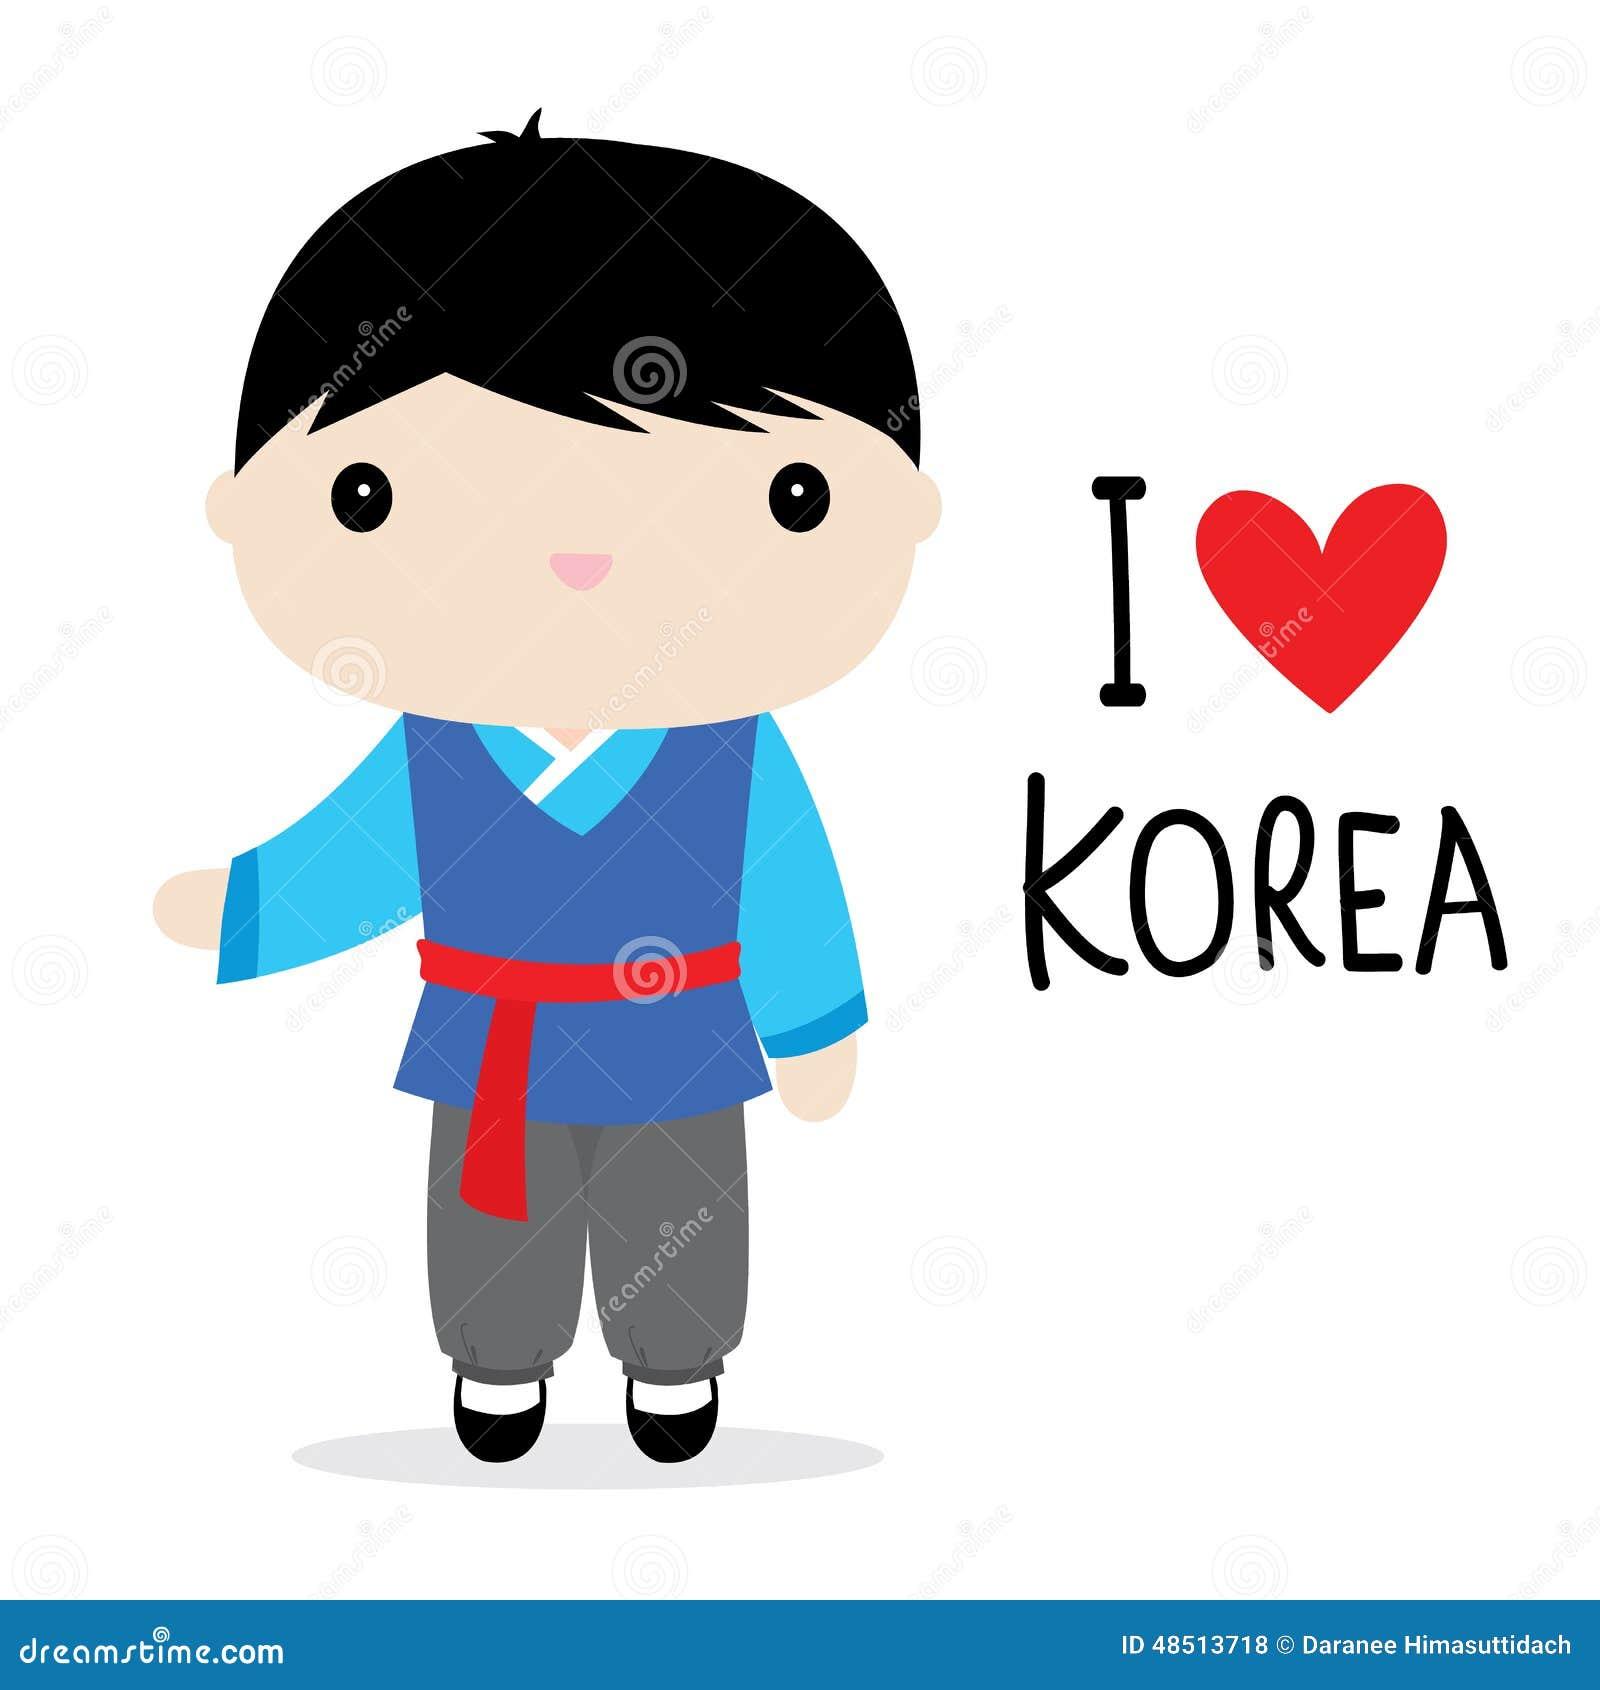 korean cartoon clipart - photo #31